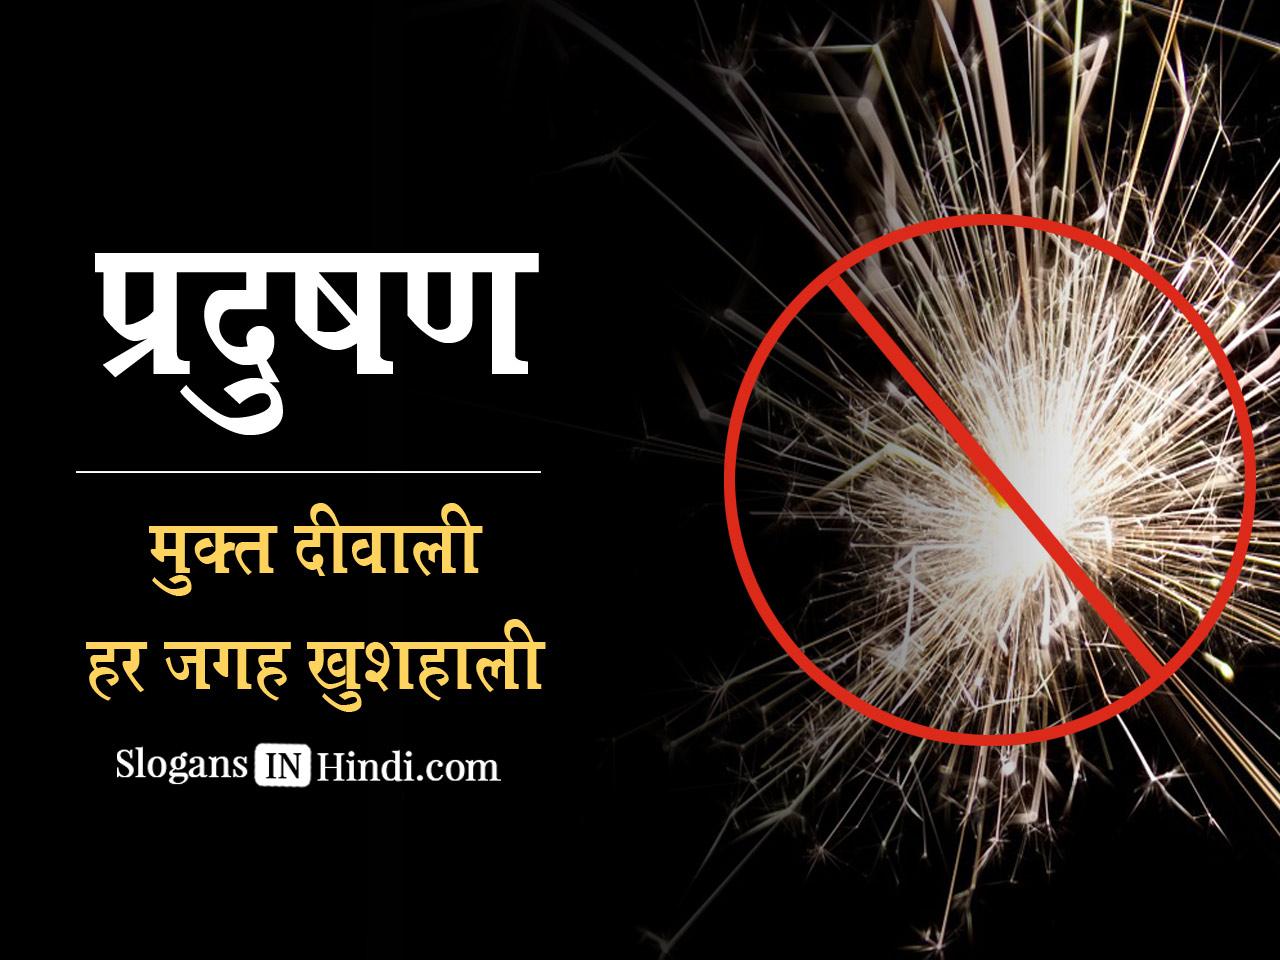 http://www.slogansinhindi.com/wp-content/uploads/2016/05/Pradushan-Mukat-Diwali-pt37.jpg